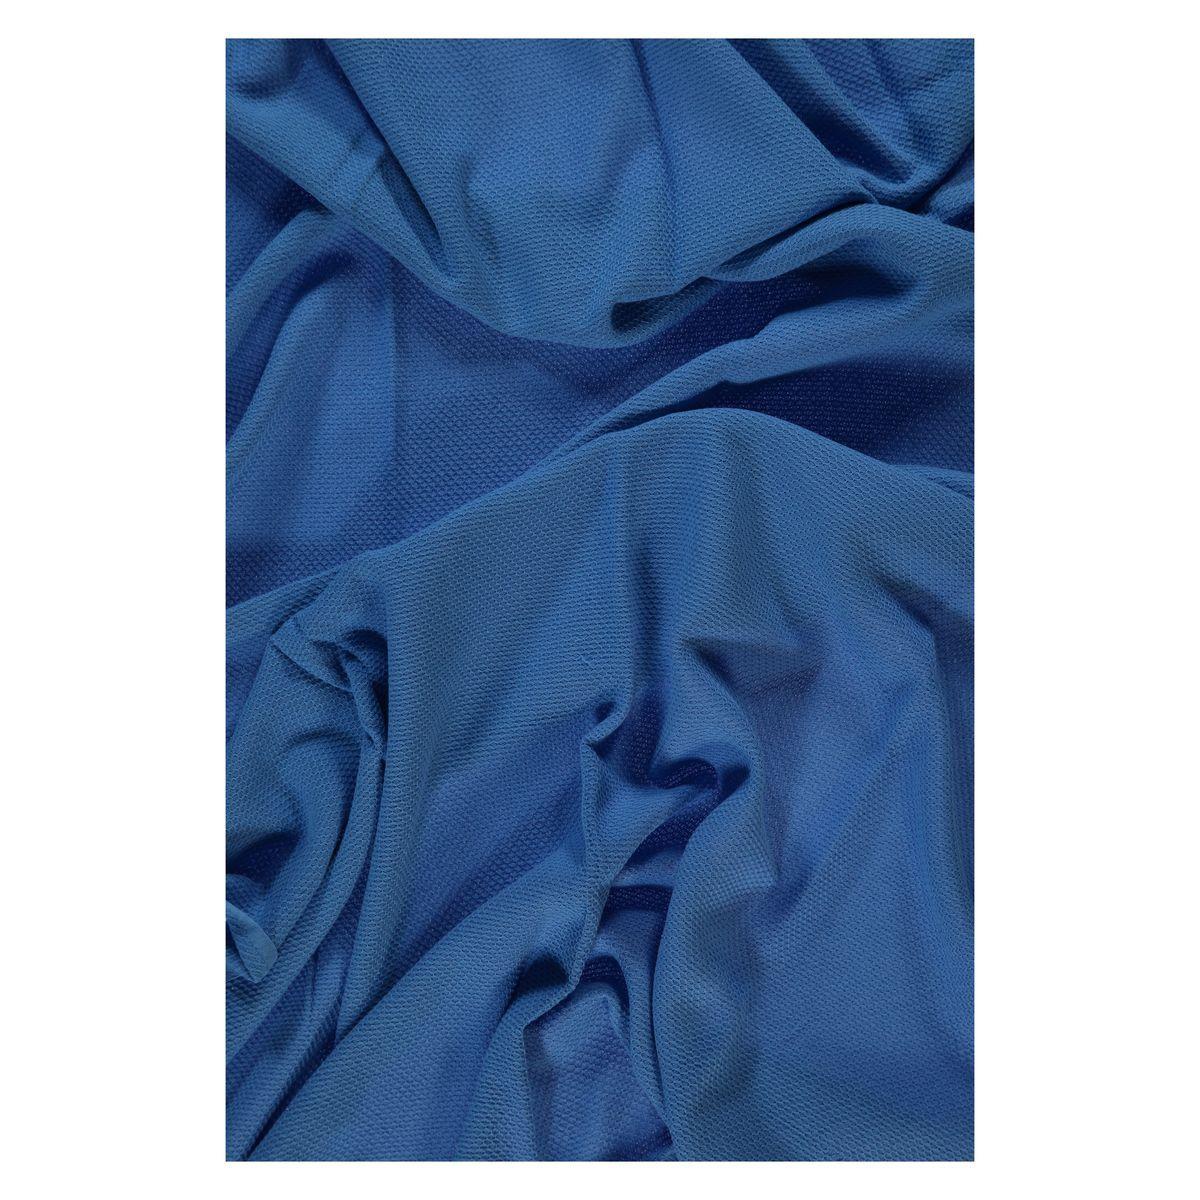 Peştemal Bal - Koyu Mavi